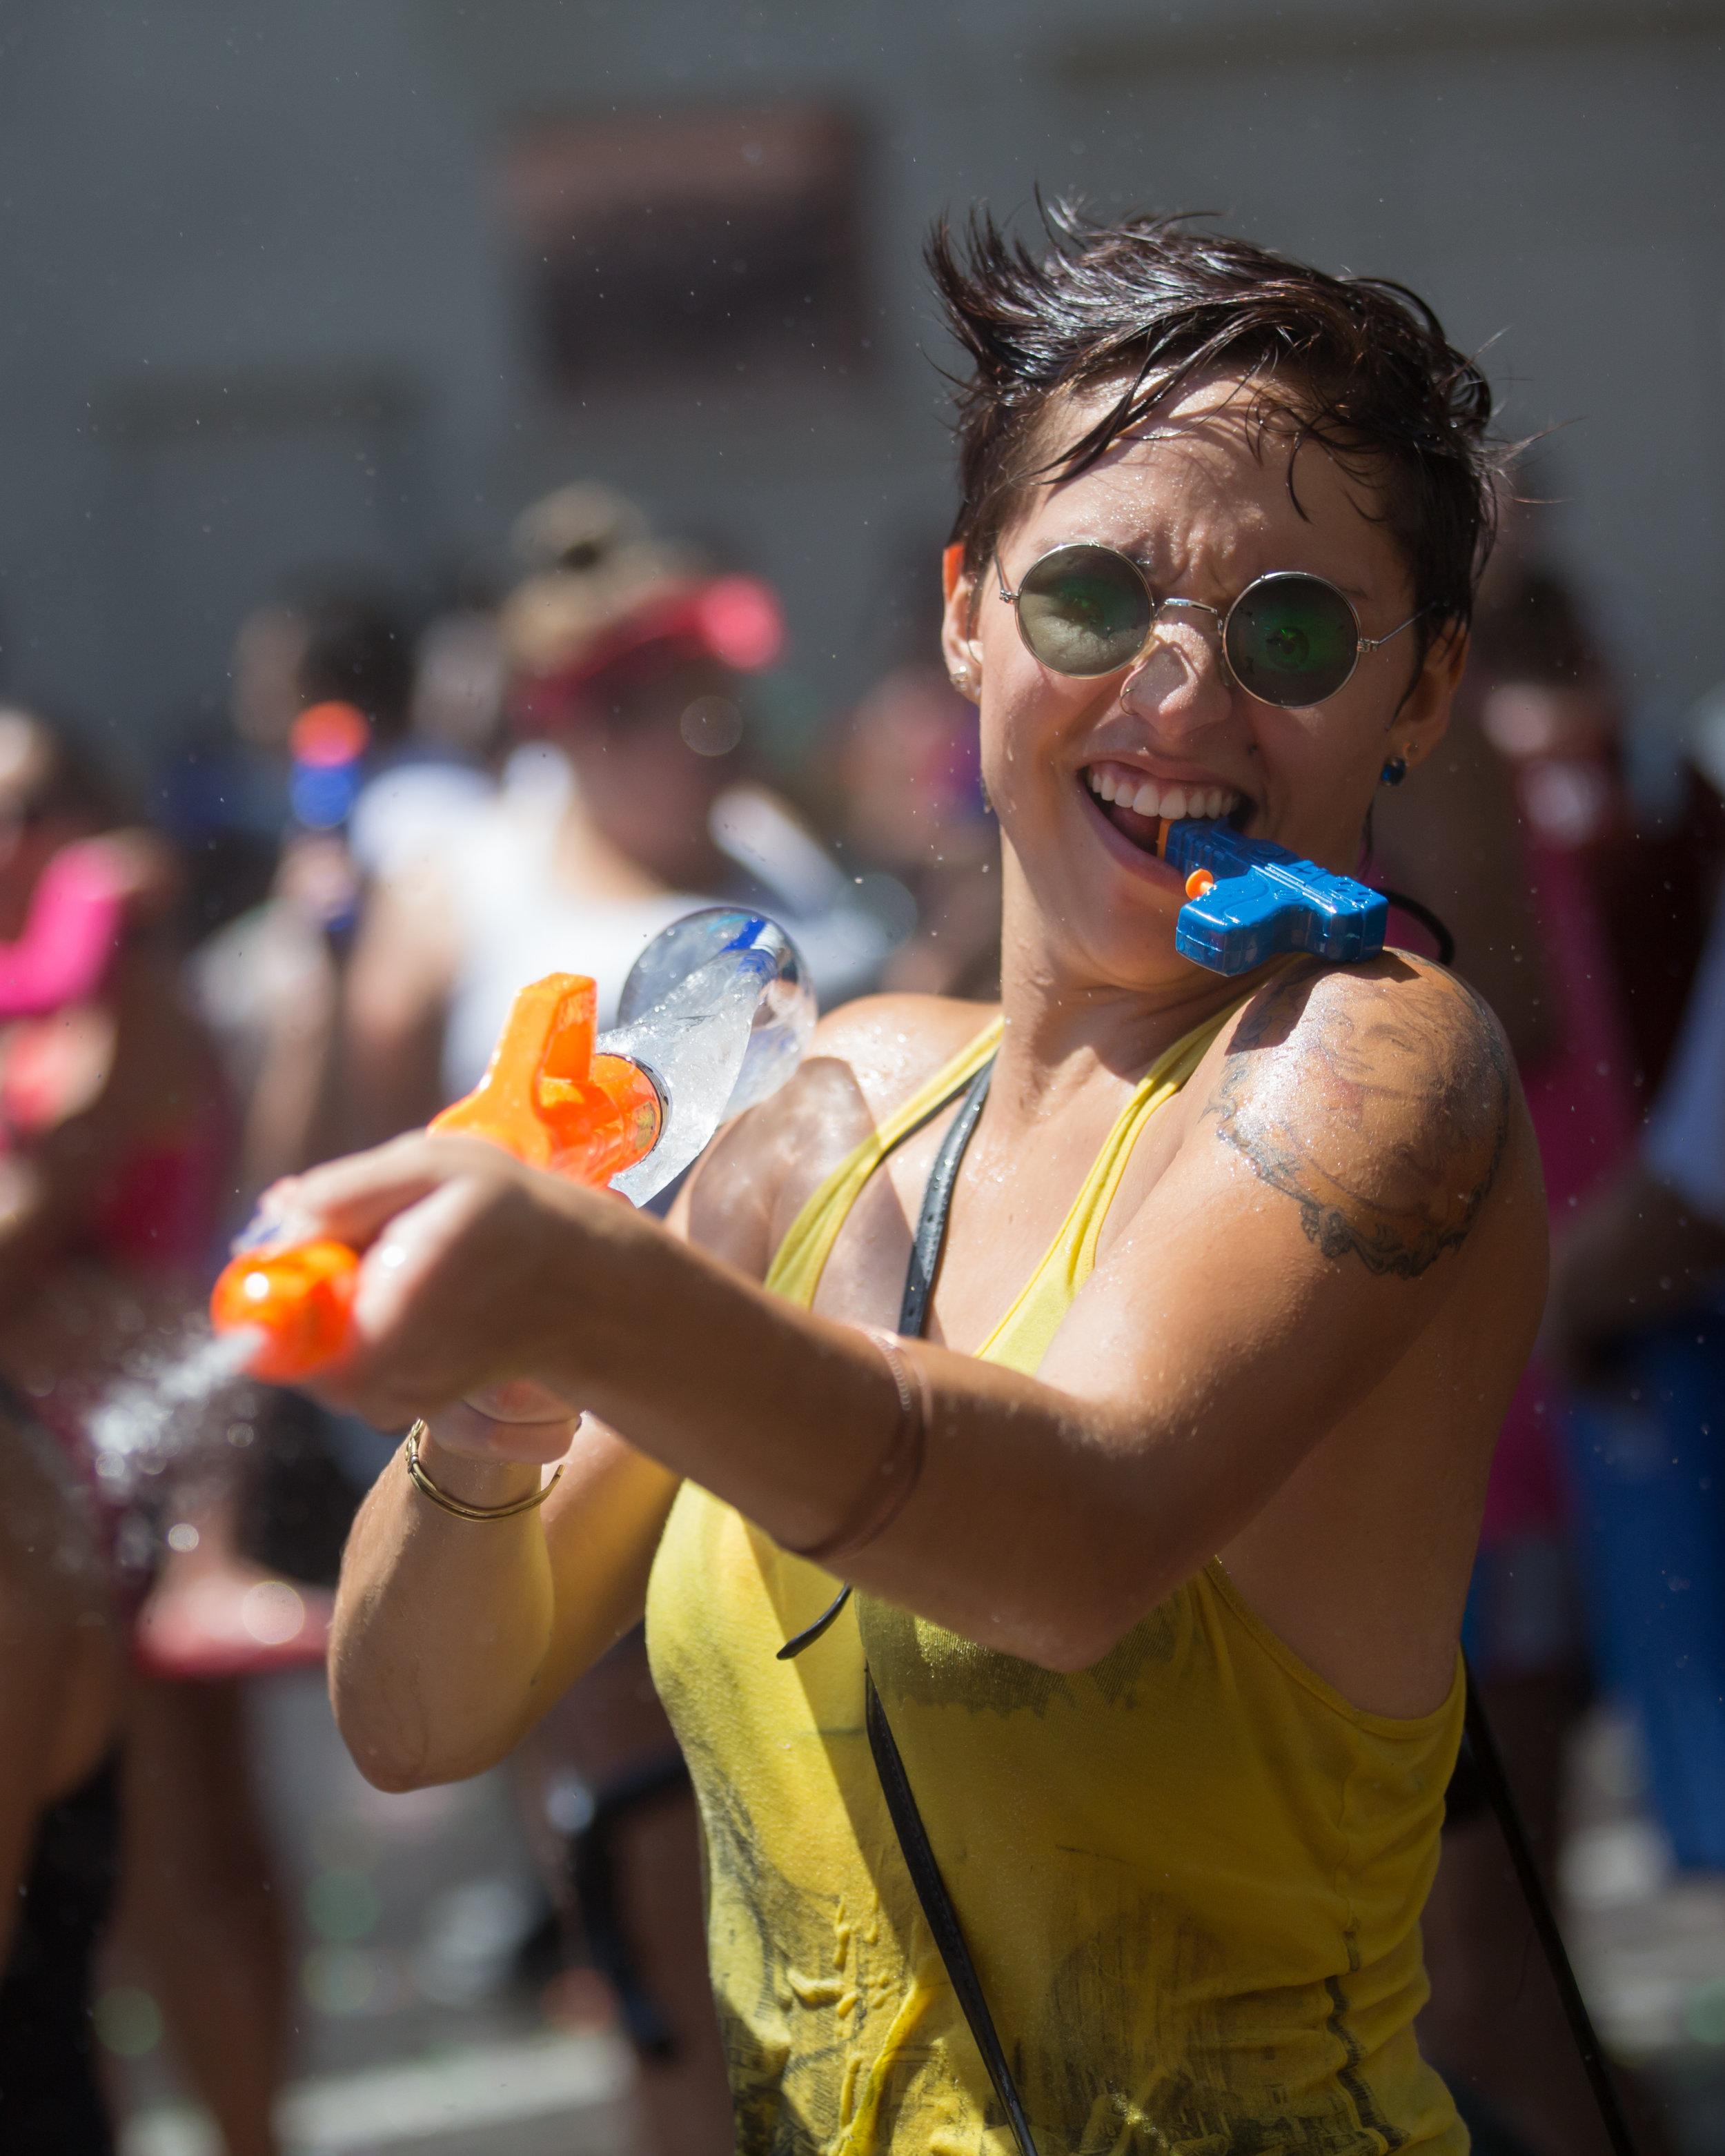 An Austinite takes part in the annual Austin Splash Mob.